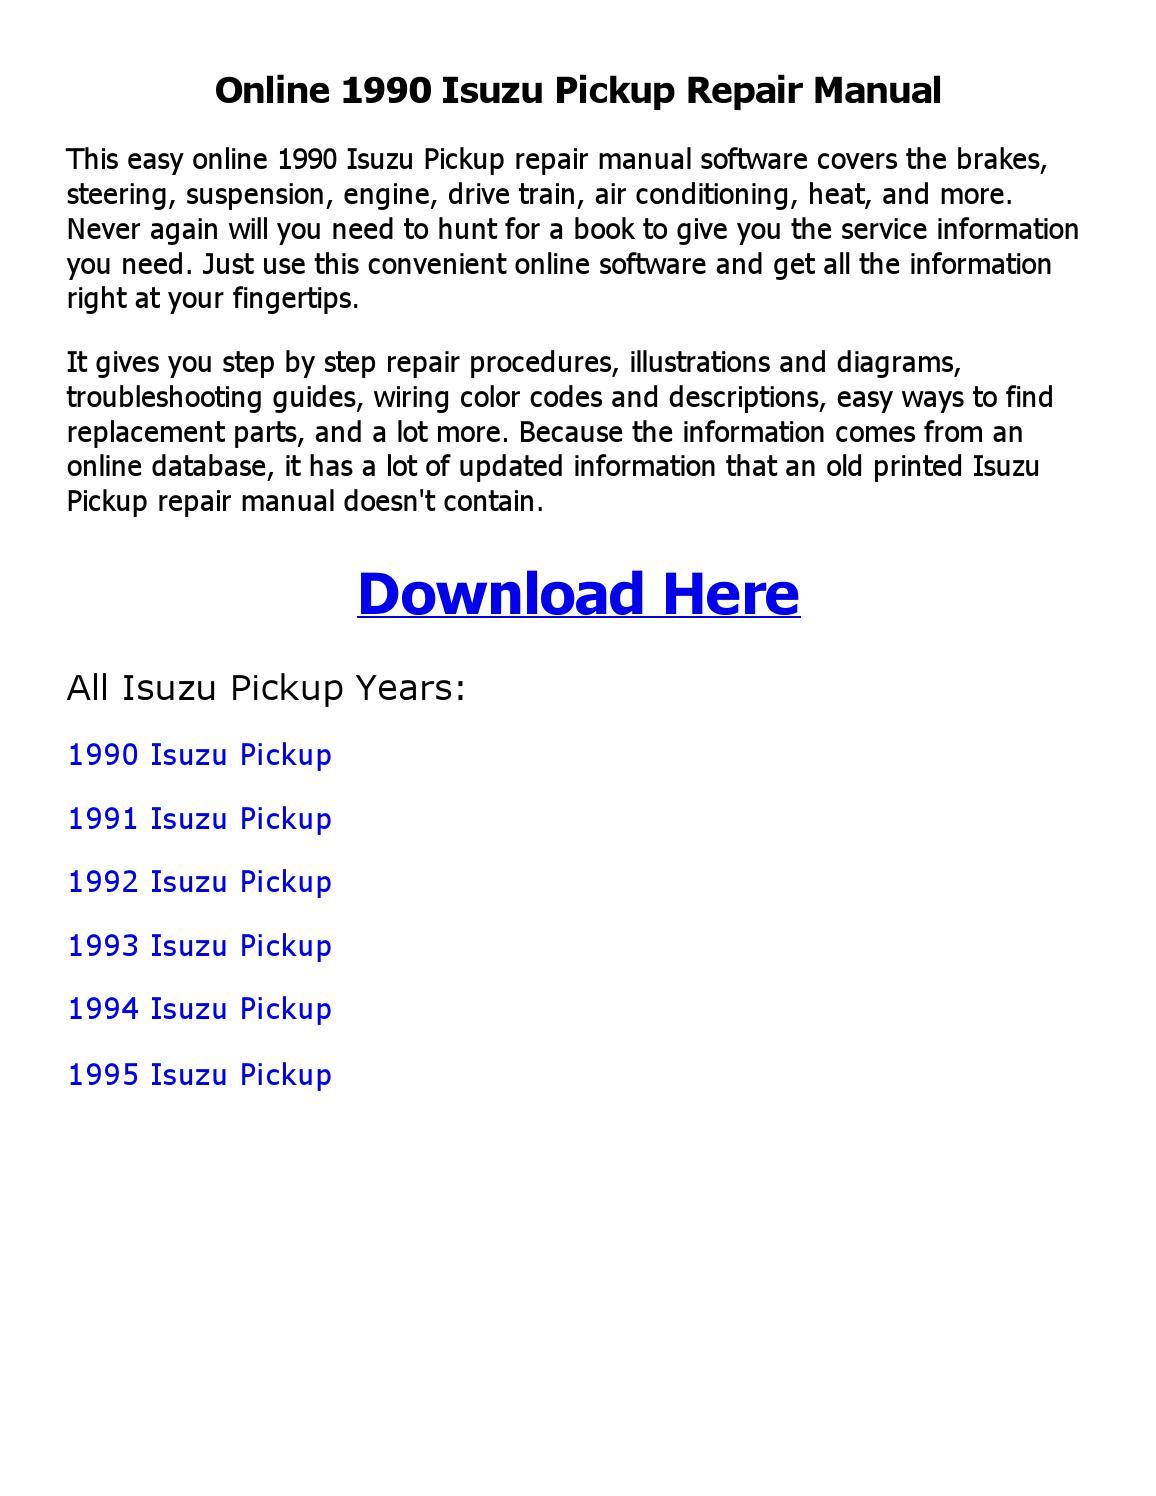 1990 Isuzu Pickup Repair Manual Online By Shoaibsiddique Issuu Truck Wiring Diagram